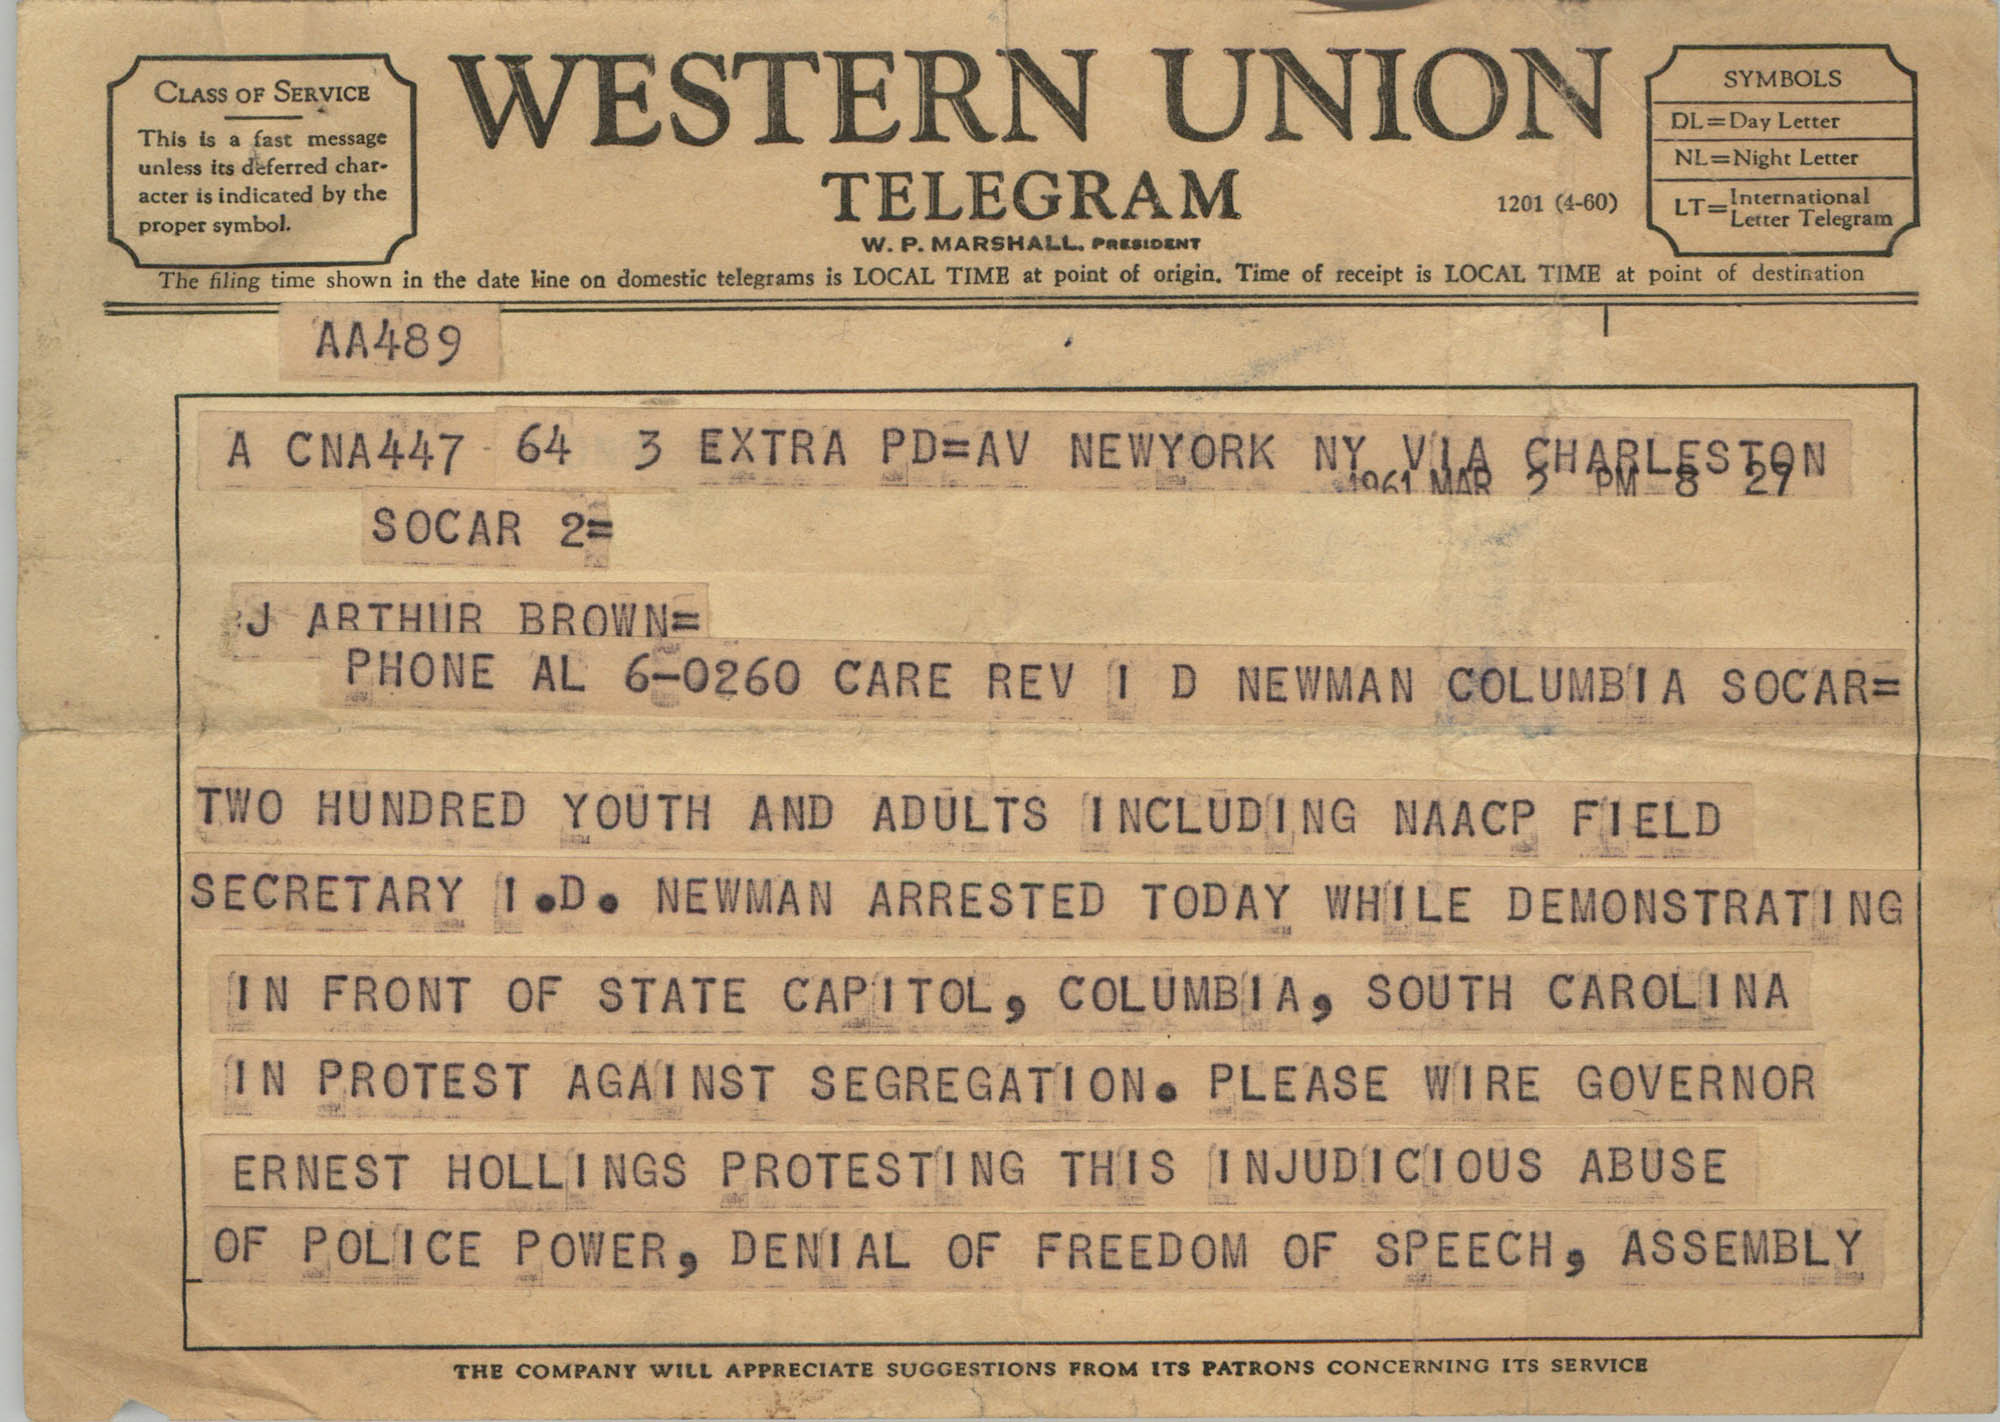 Telegram to J. Arthur Brown, March 2, 1961